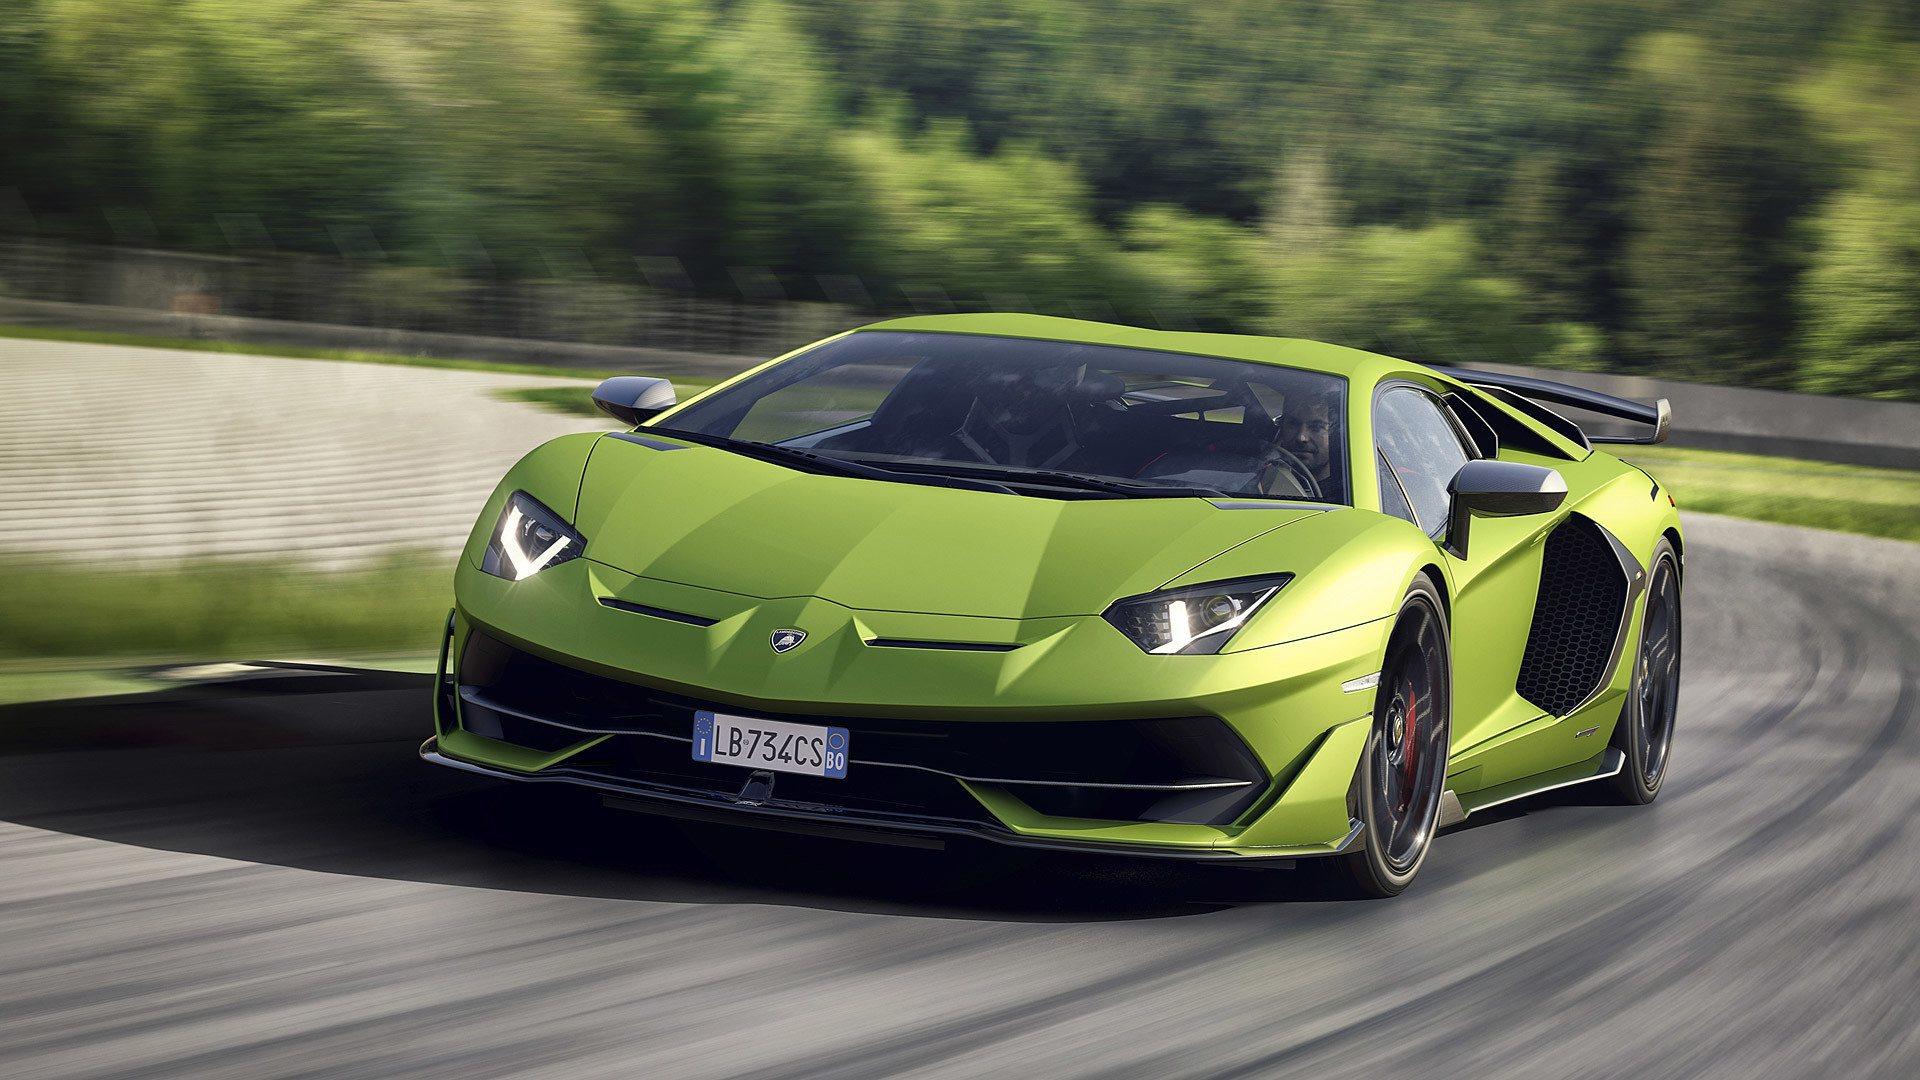 Used Lamborghini for Sale in Toronto ON